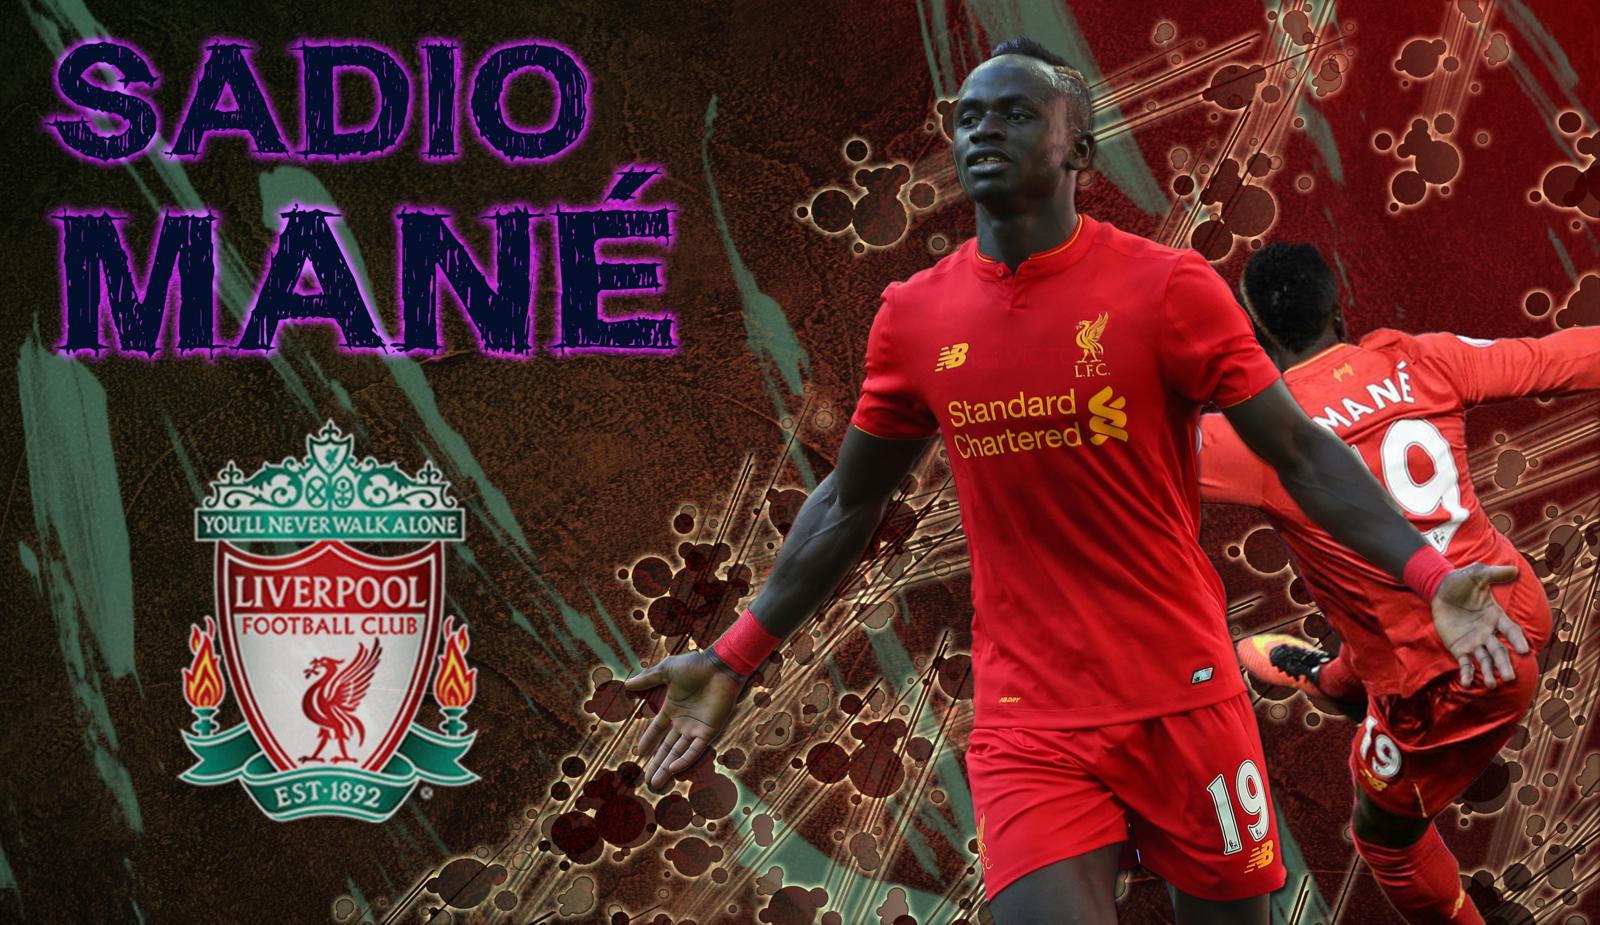 Sadio Mane   Liverpool FC   Wallpaper by Leonel350 on 1600x925